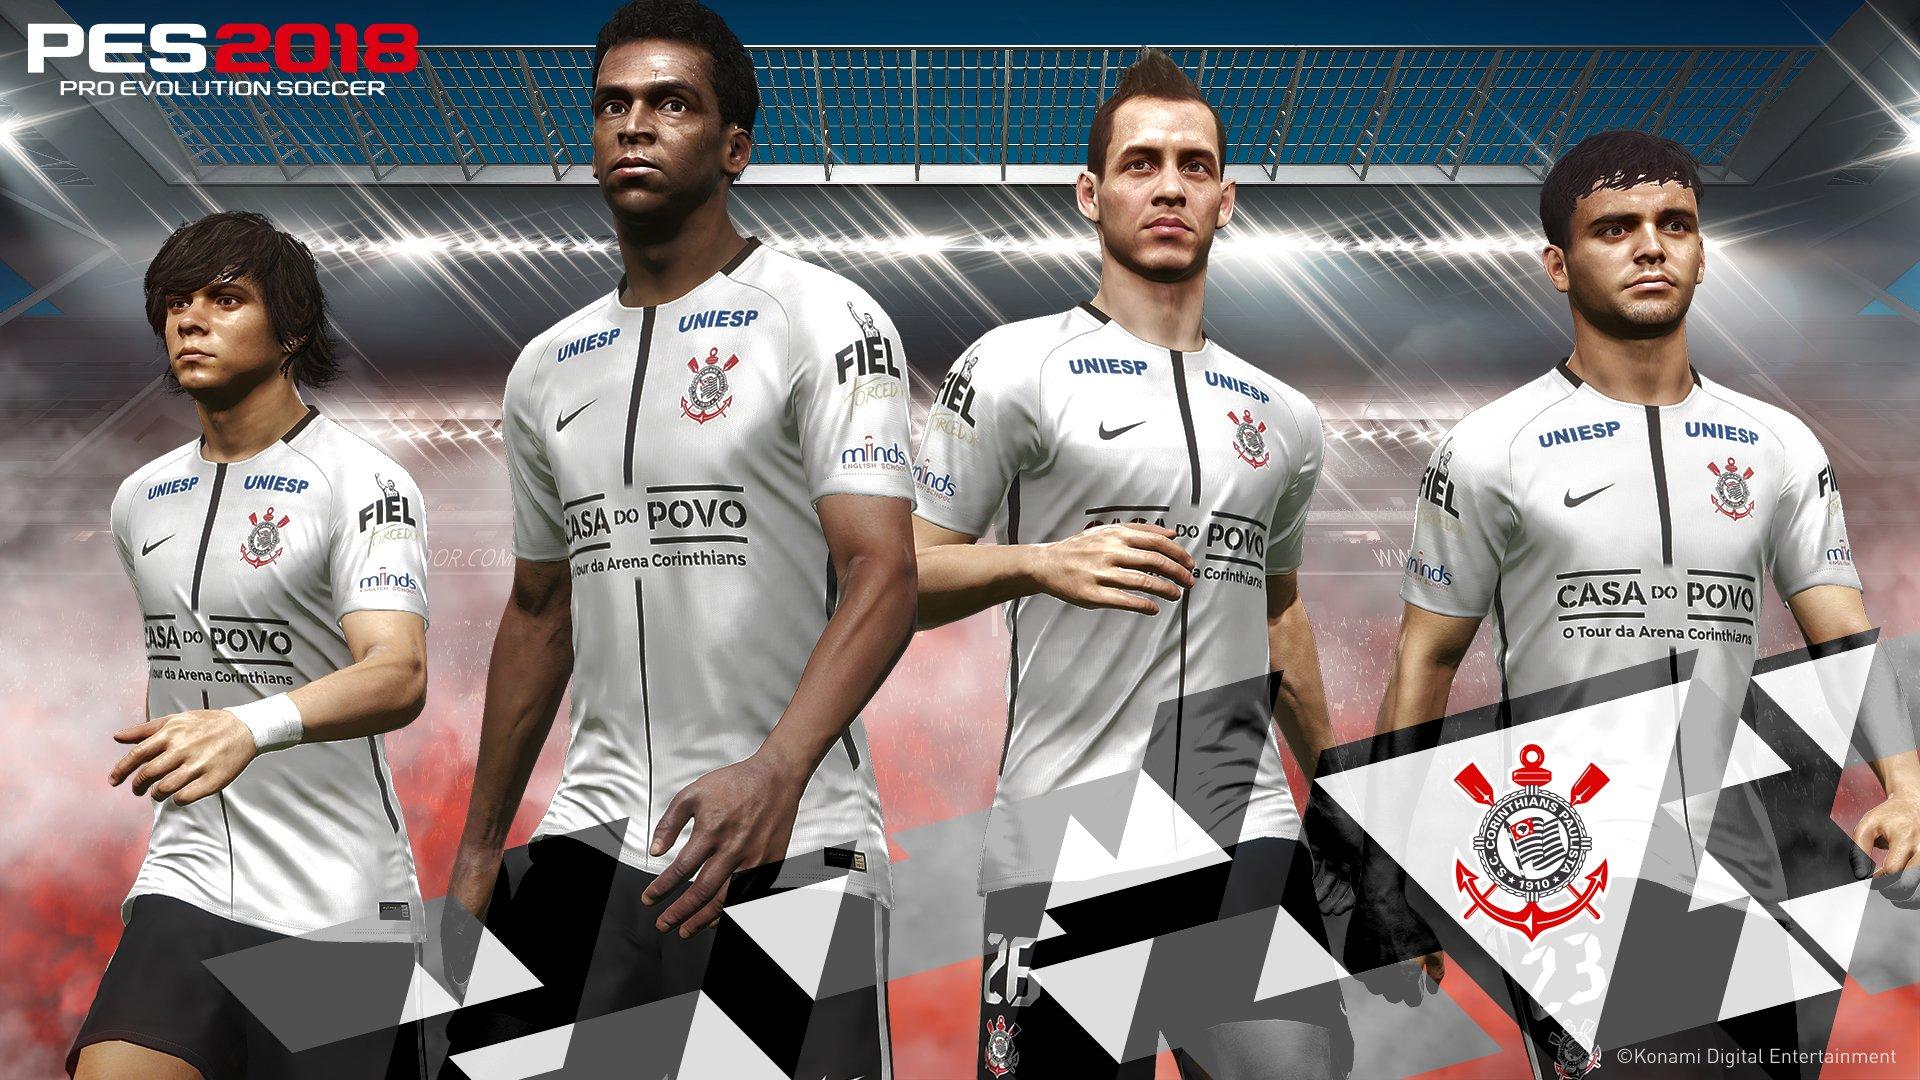 PES 2018 : Konami partenaire du club de Colo-Colo